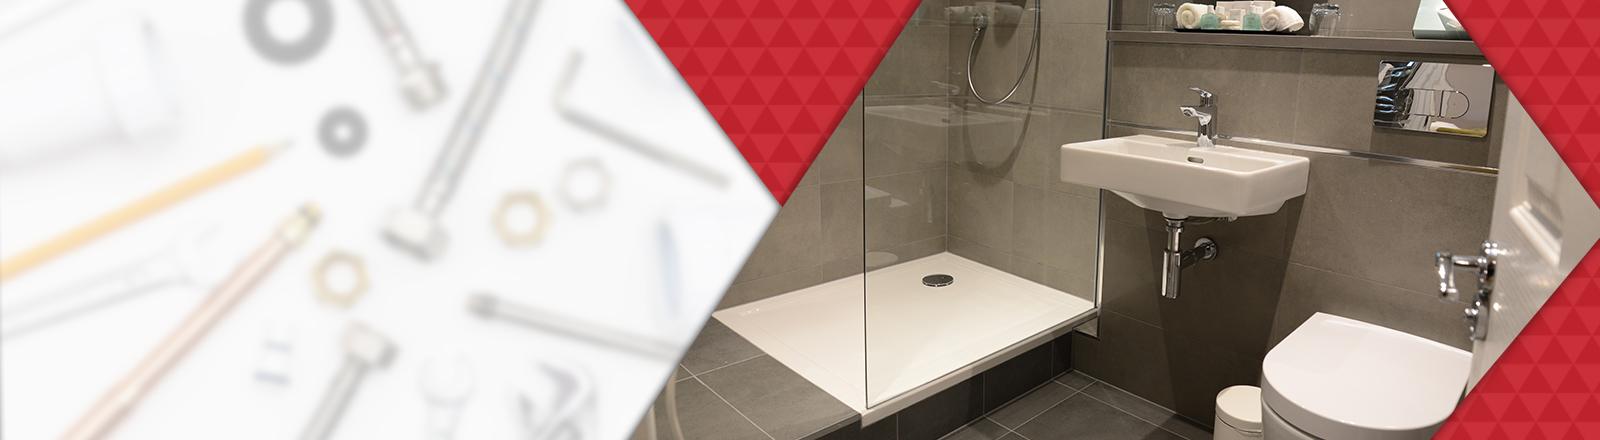 Bathroom Refurbishment and Installation Hammersmith